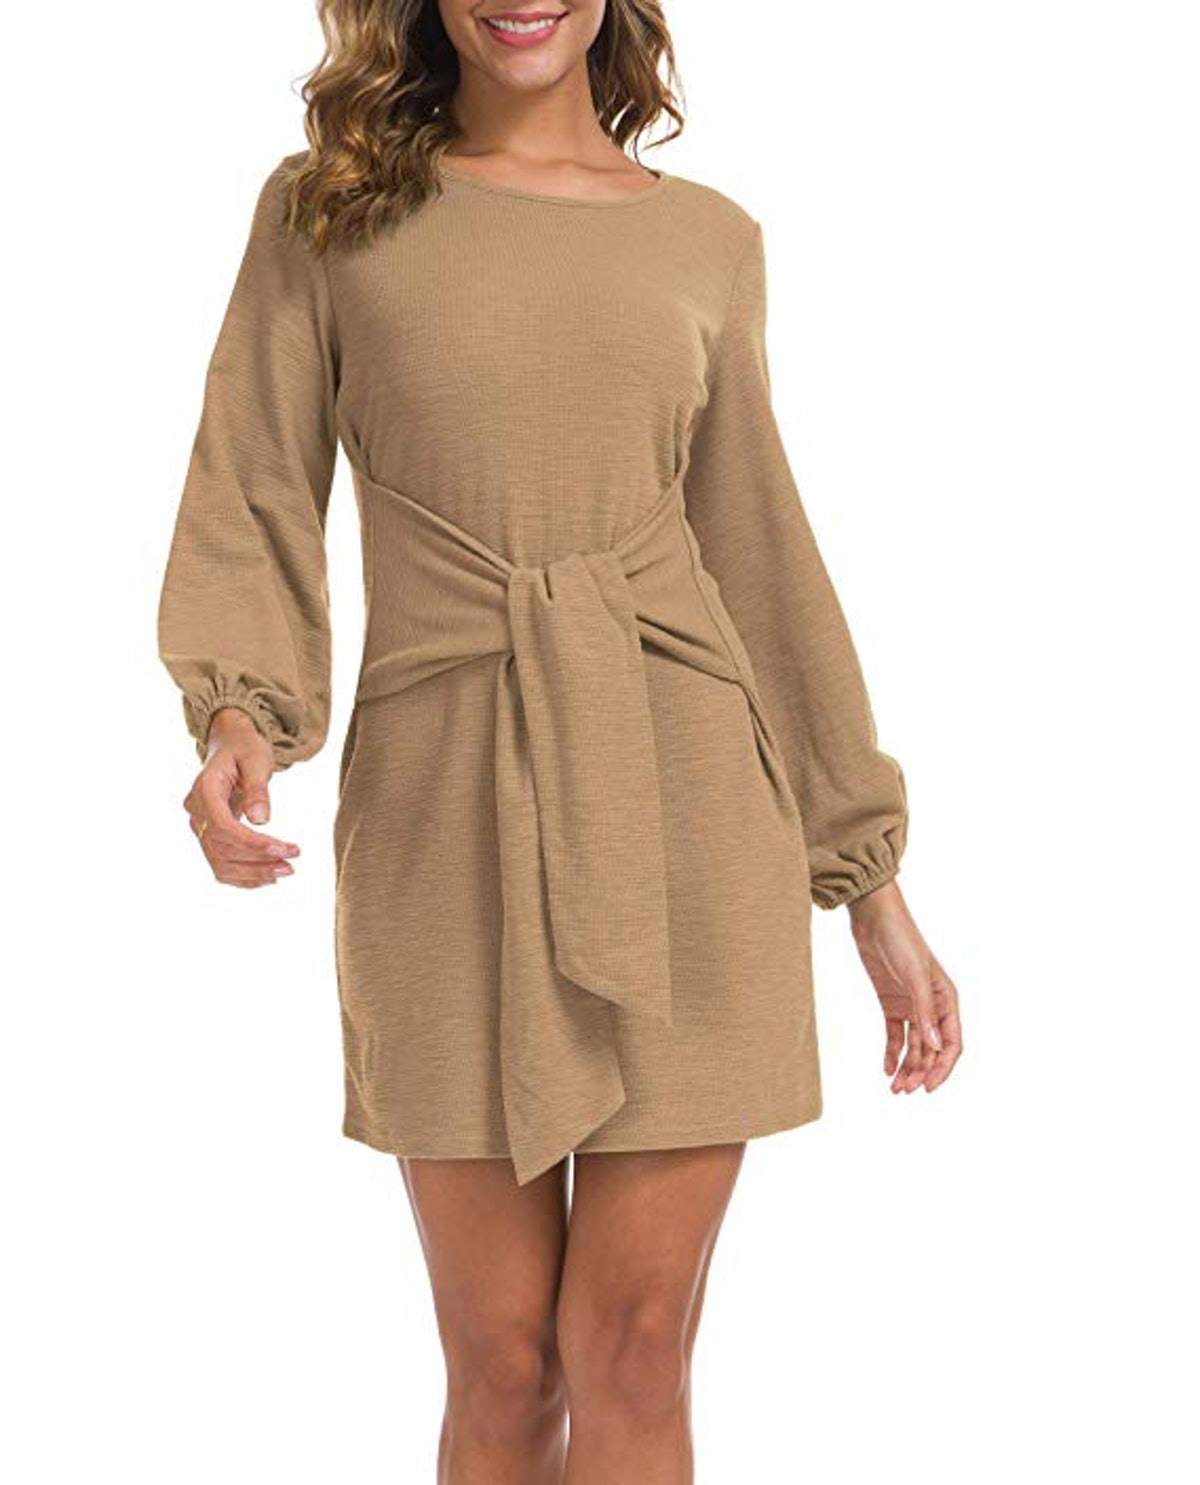 Lionstill Women's Tie Waist Sweater Dresses